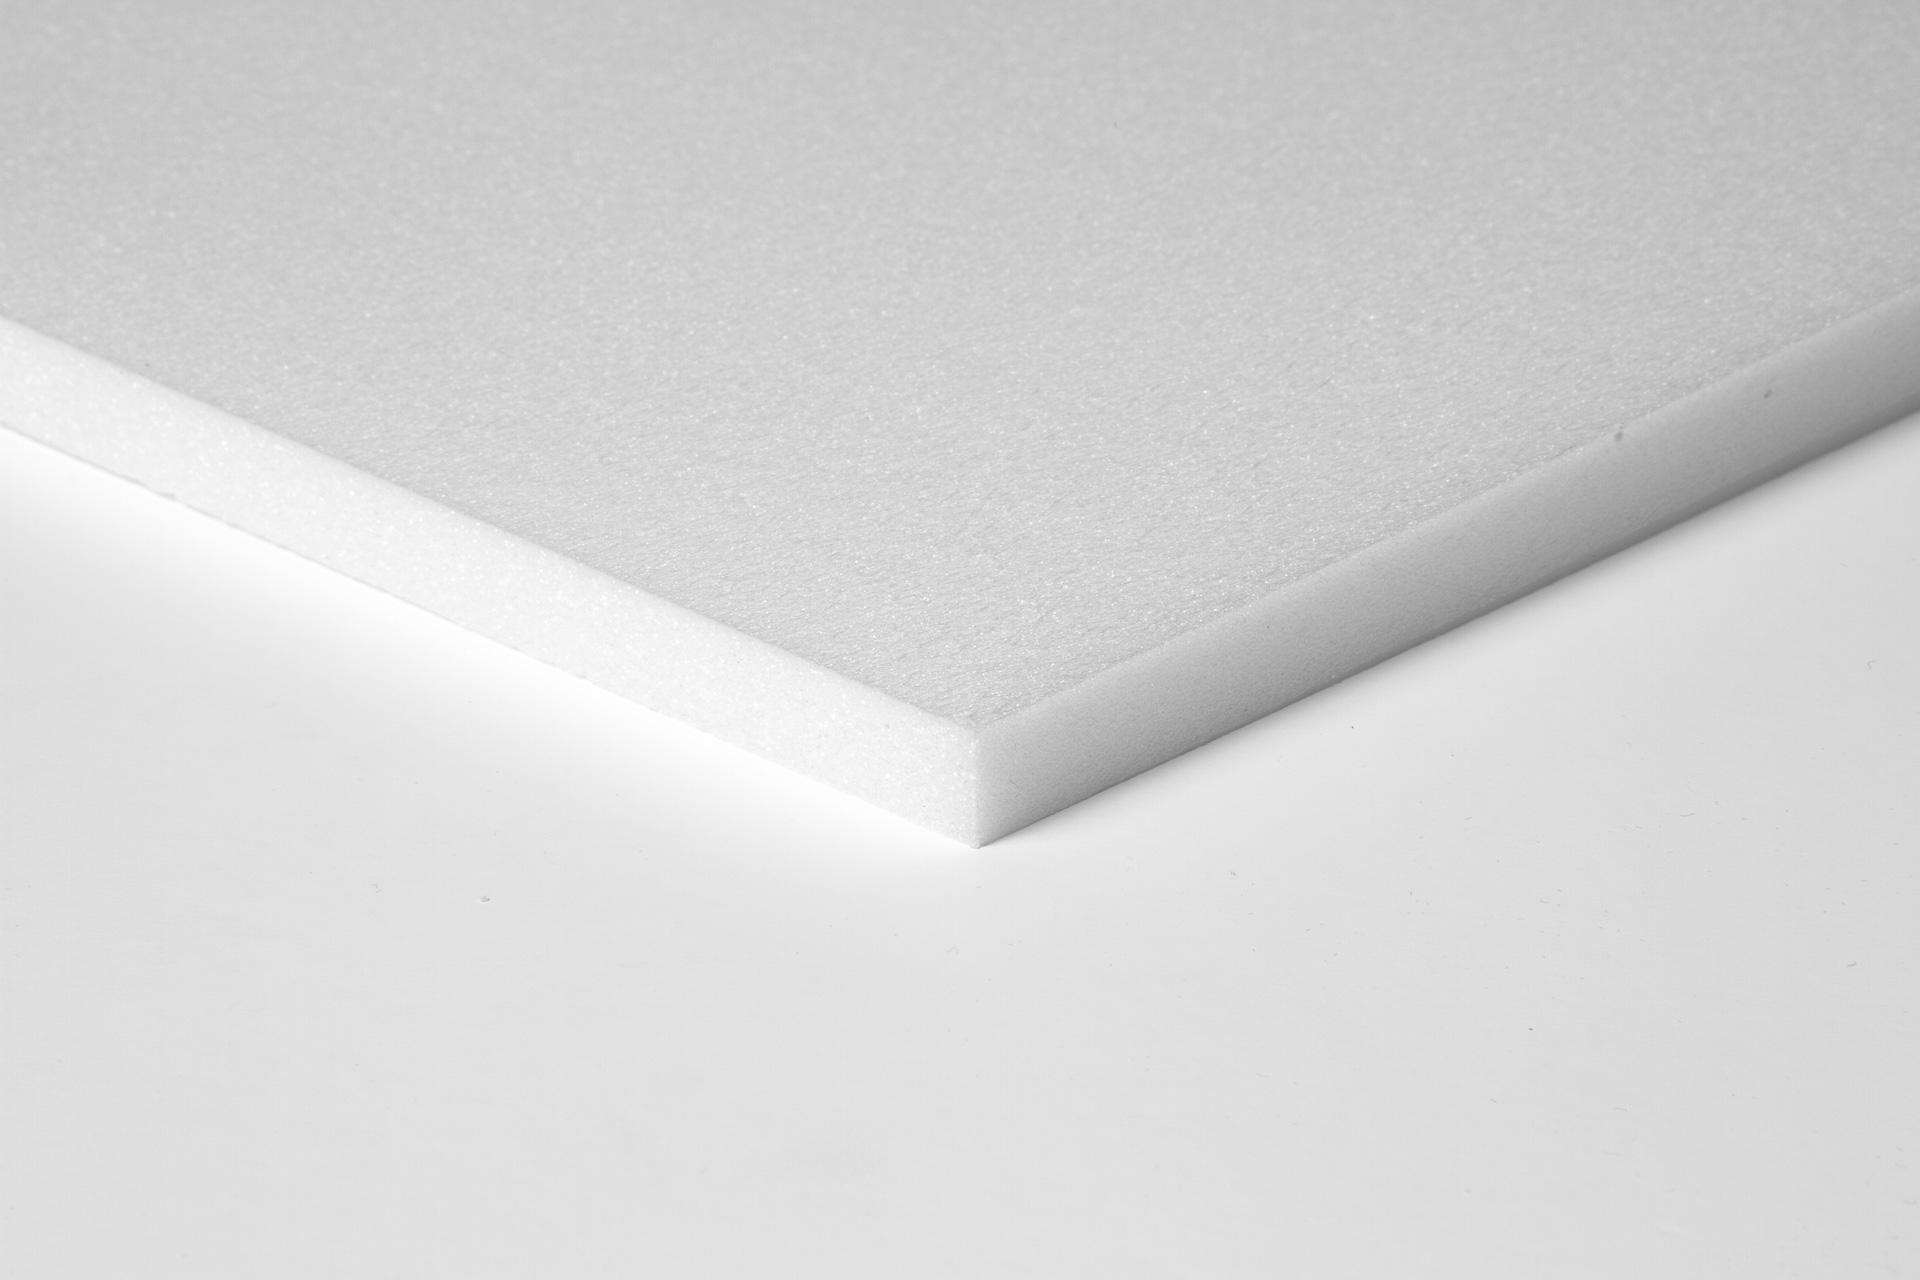 Airplac® PrintFoam 10 mm